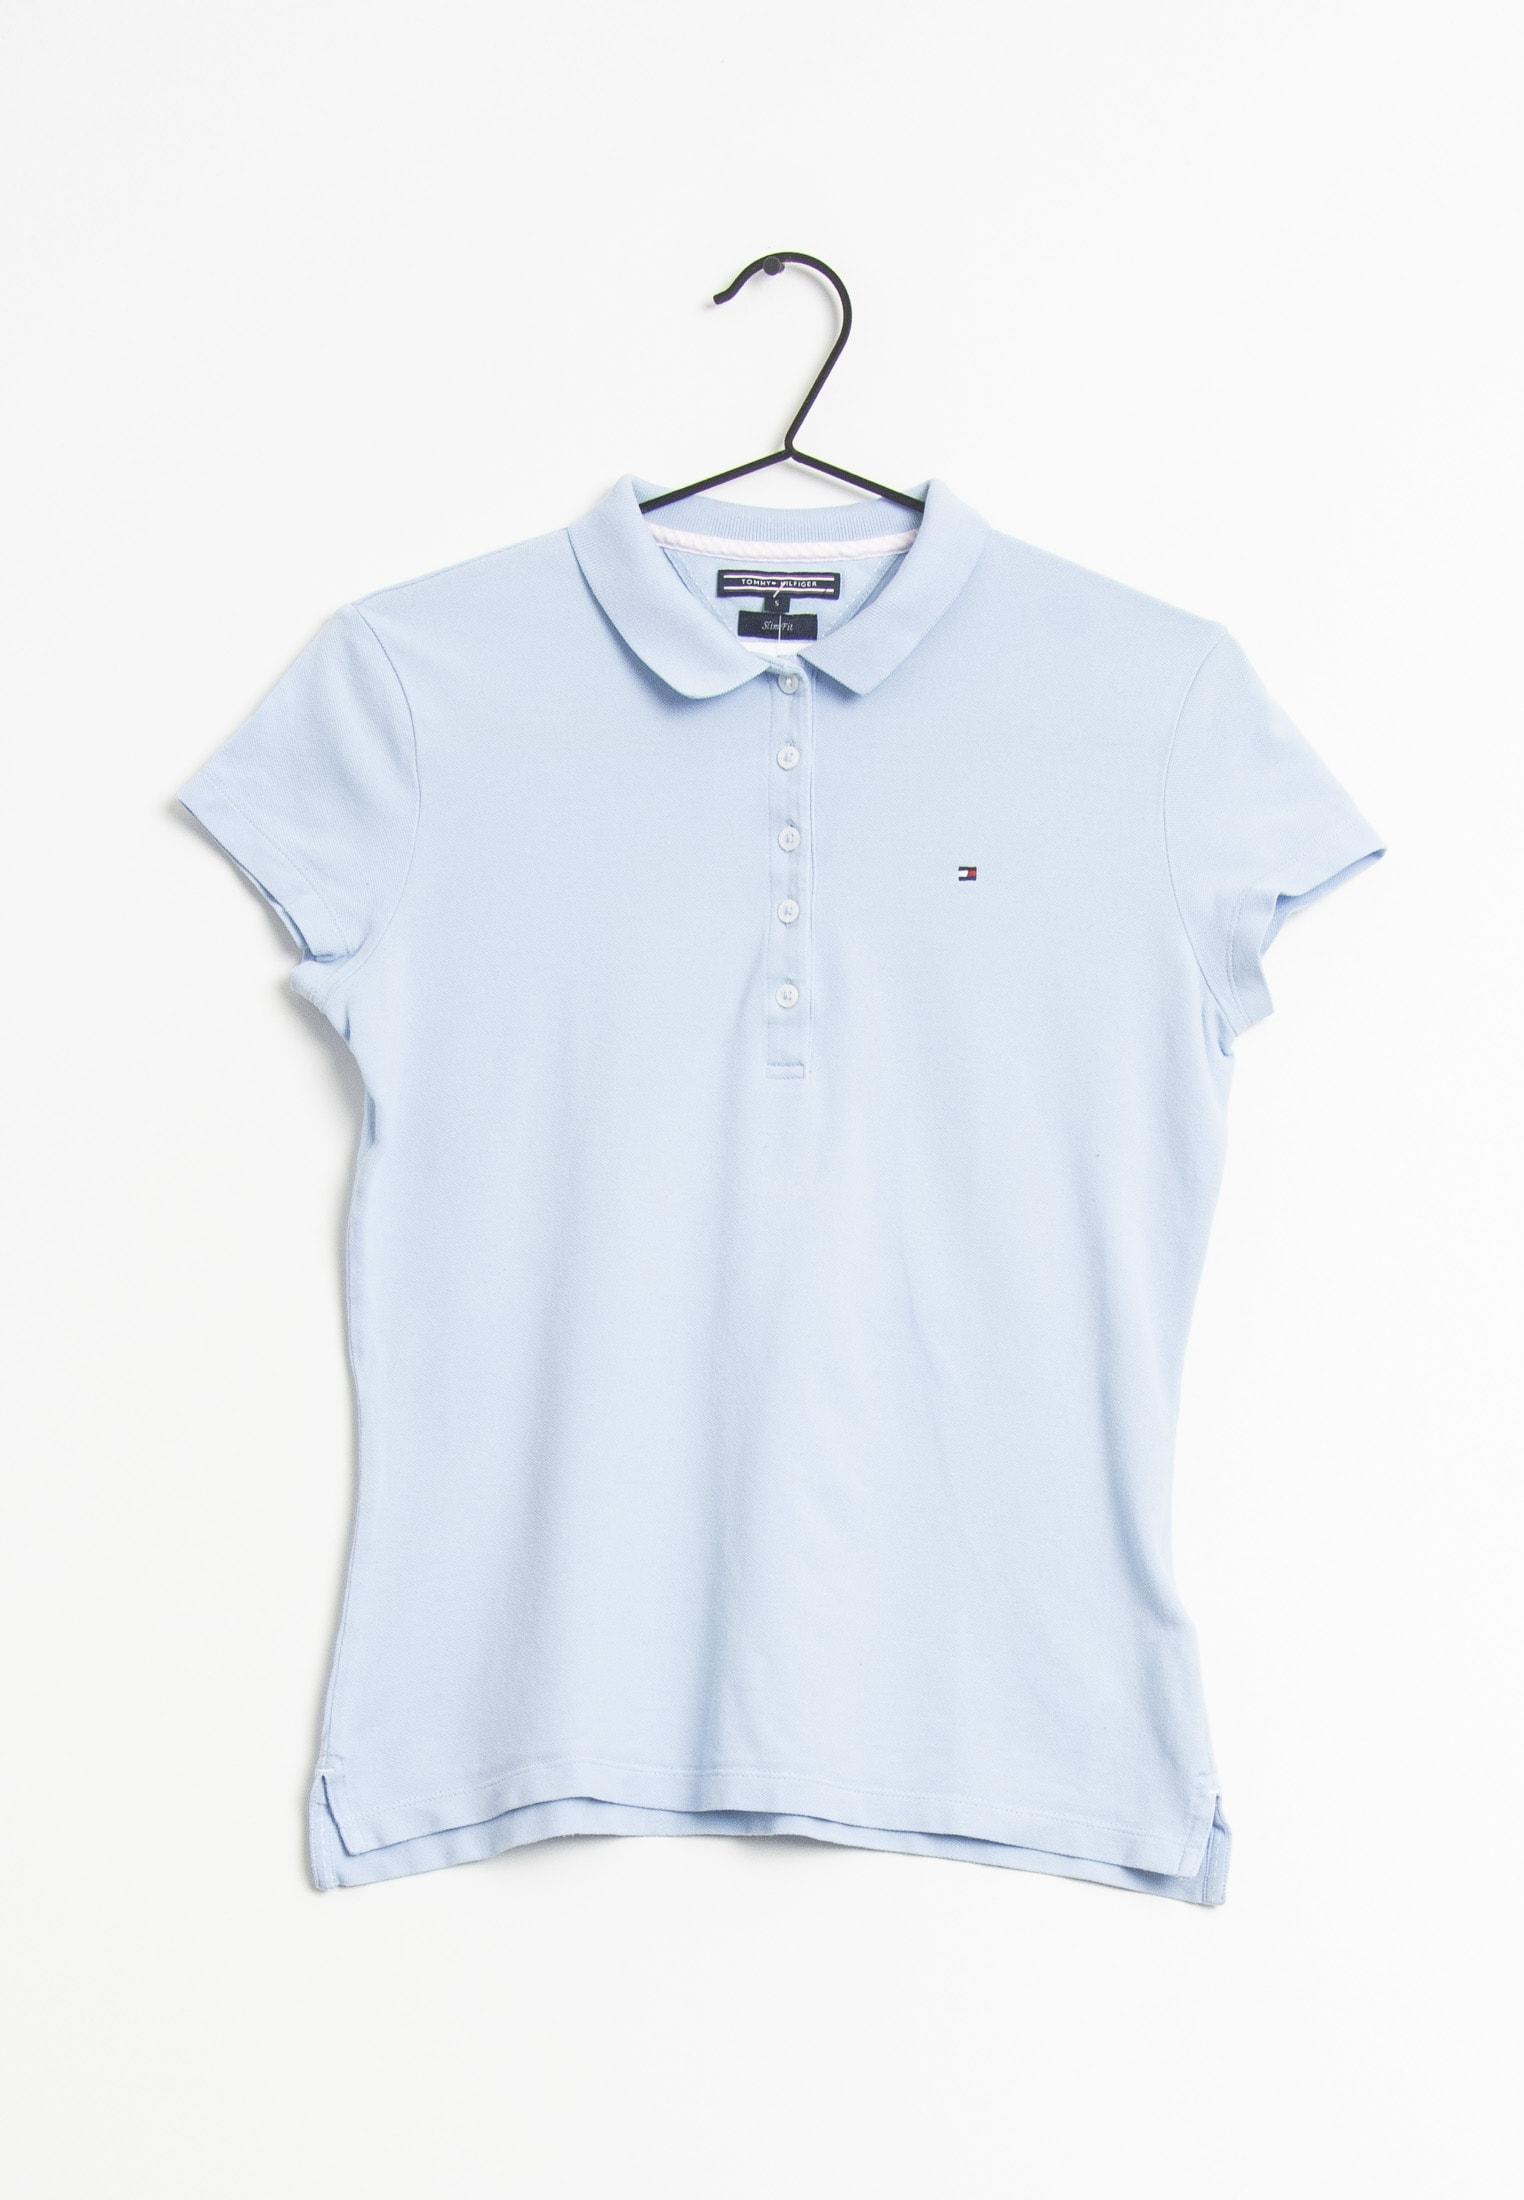 Tommy Hilfiger T-Shirt Blau Gr.S